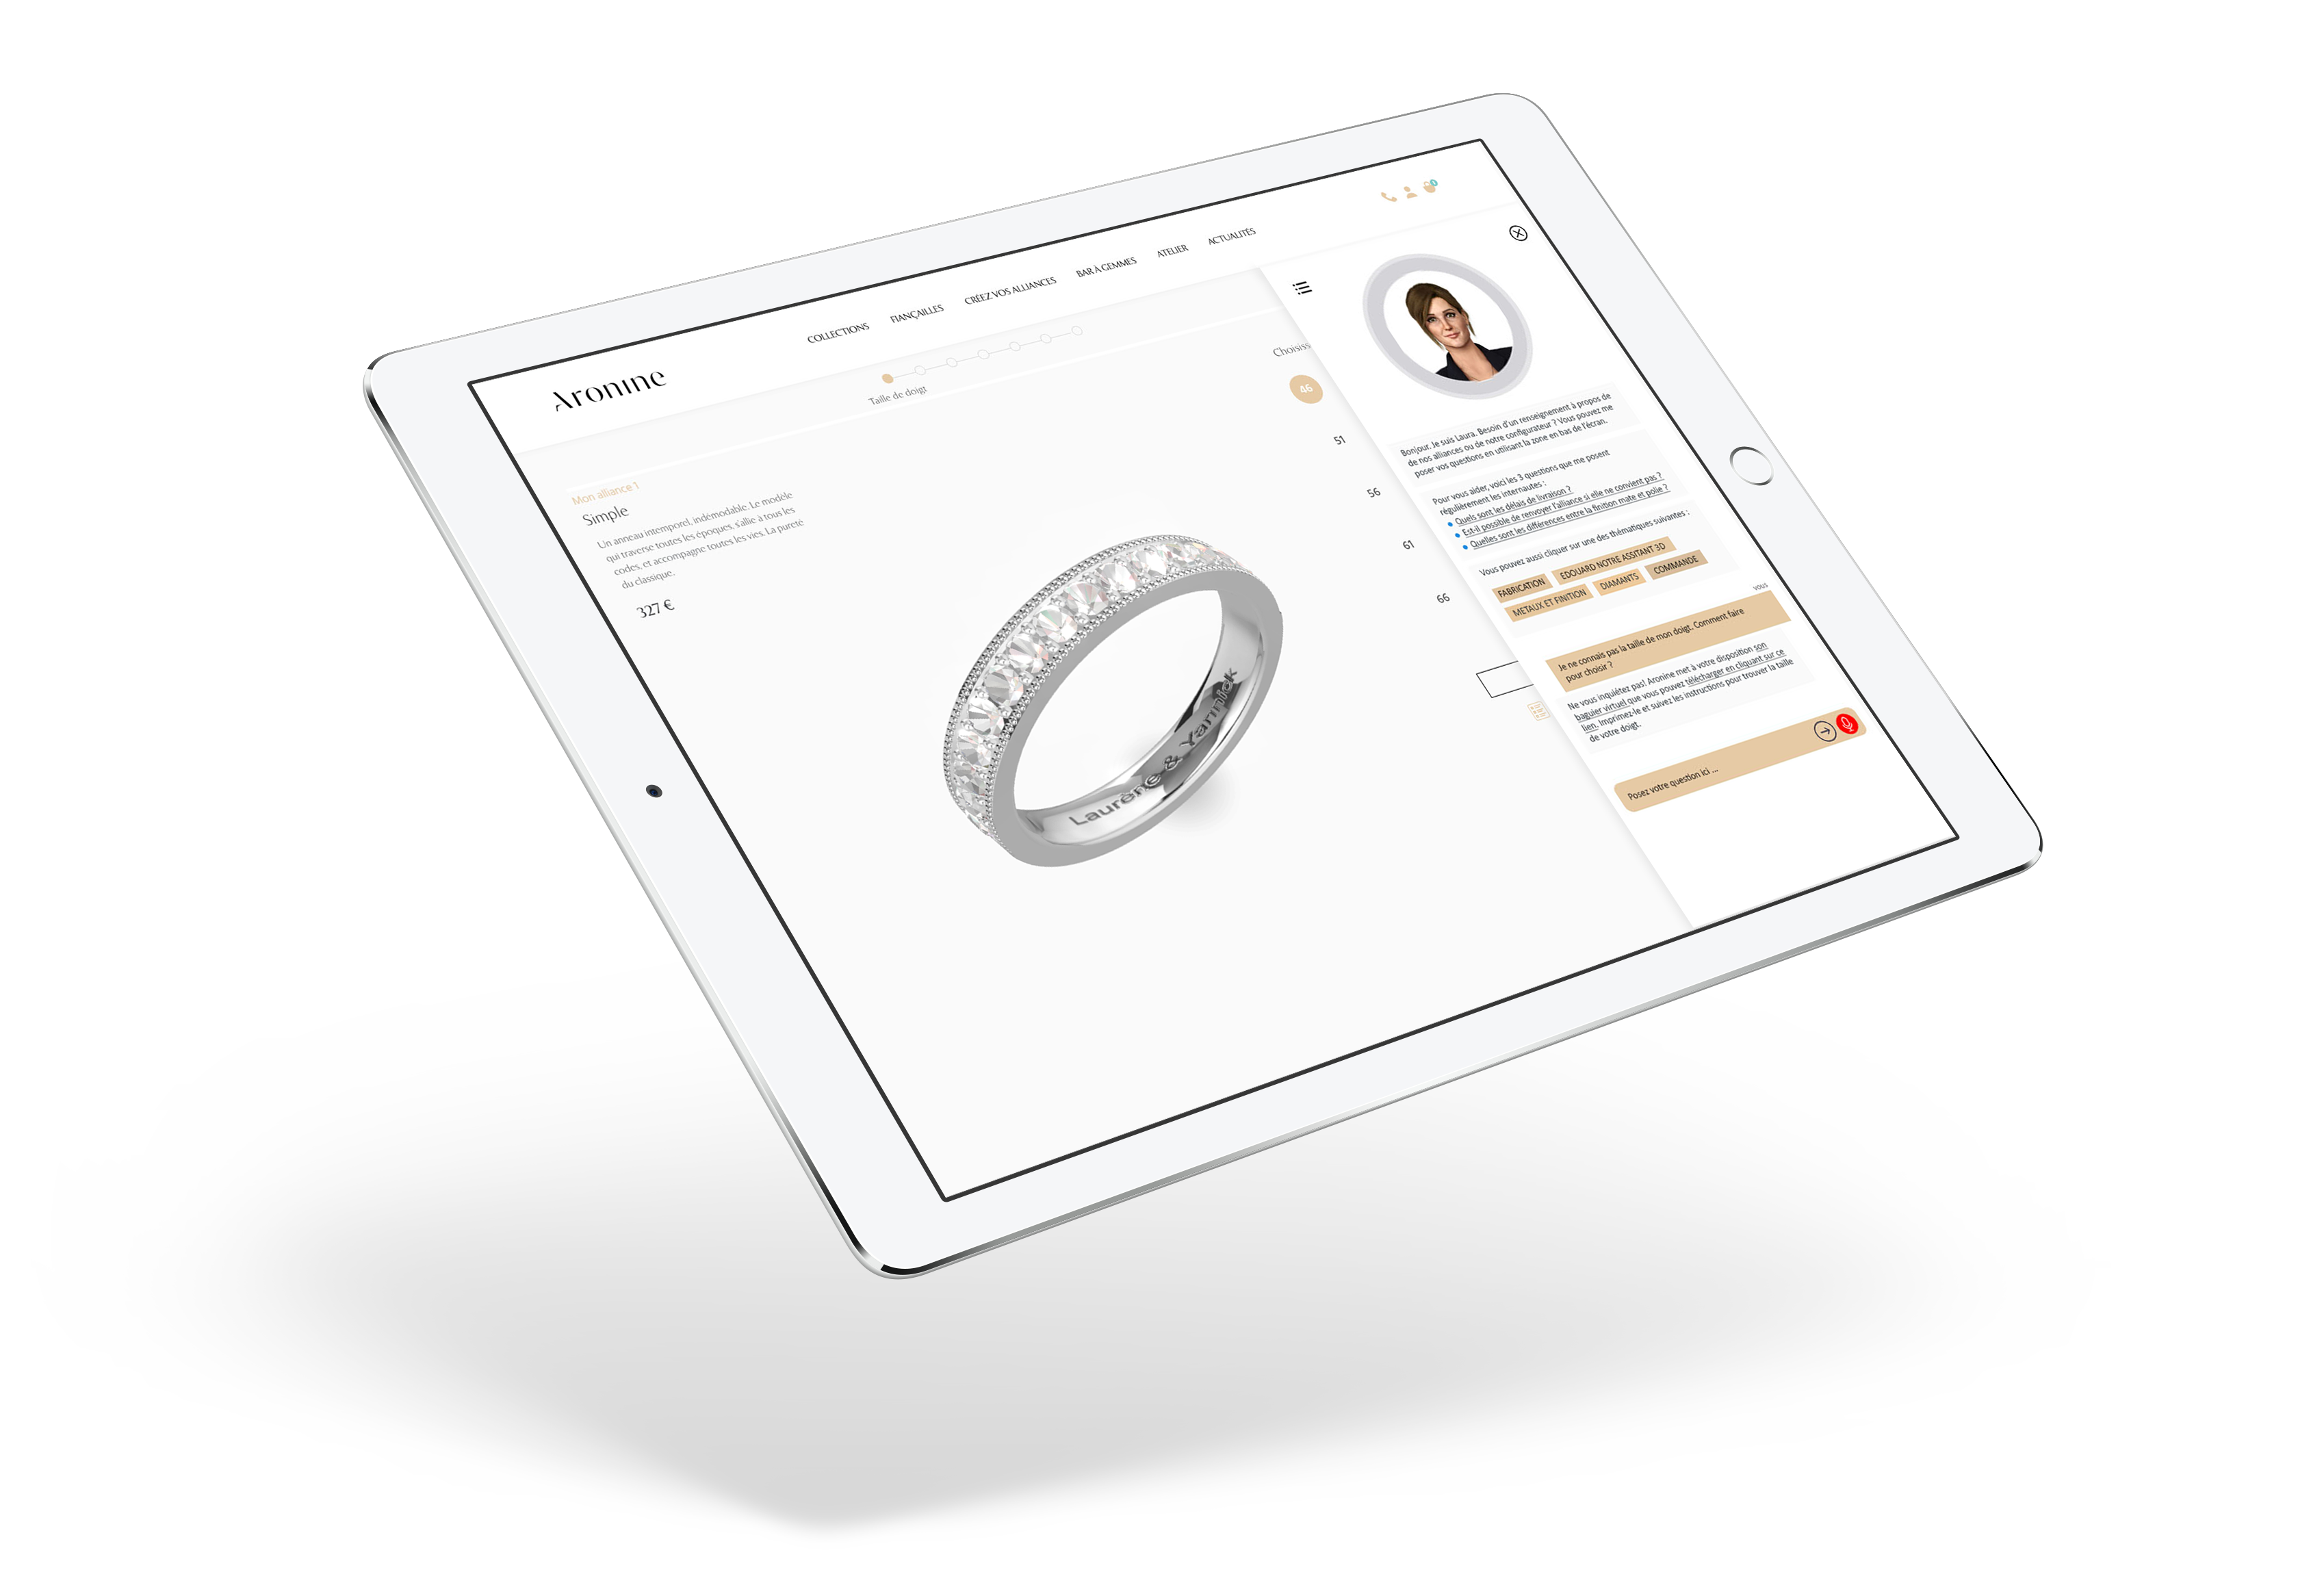 Conseiller Clientele Conversationnel Chatbot 3Dswipe